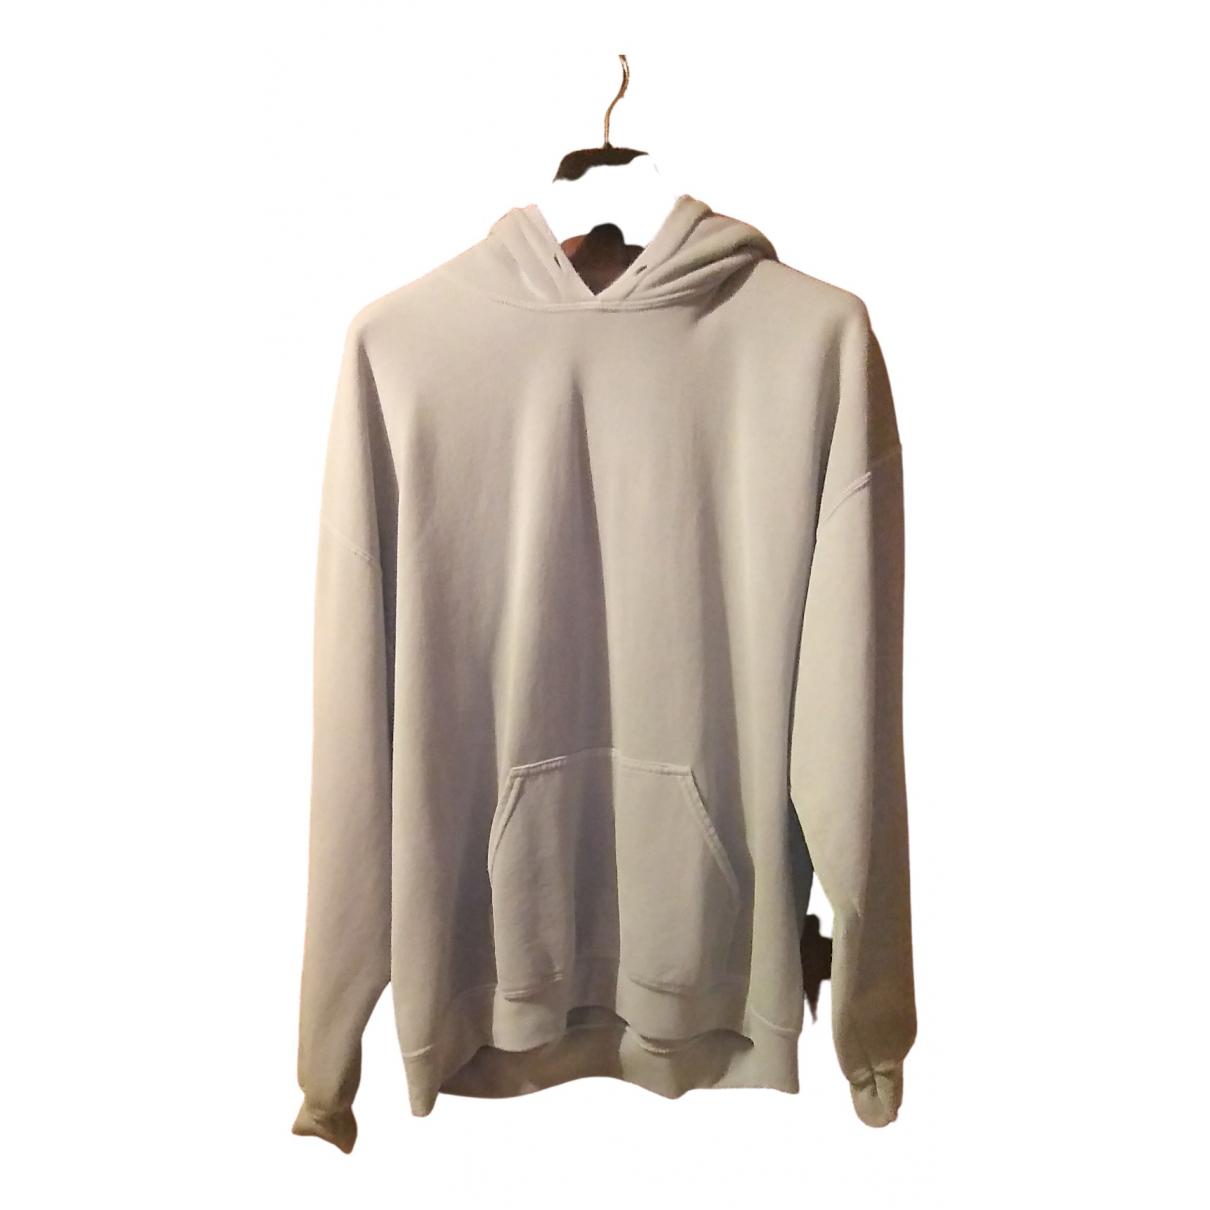 Reclaimed Vintage \N Grey Cotton Knitwear & Sweatshirts for Men S International